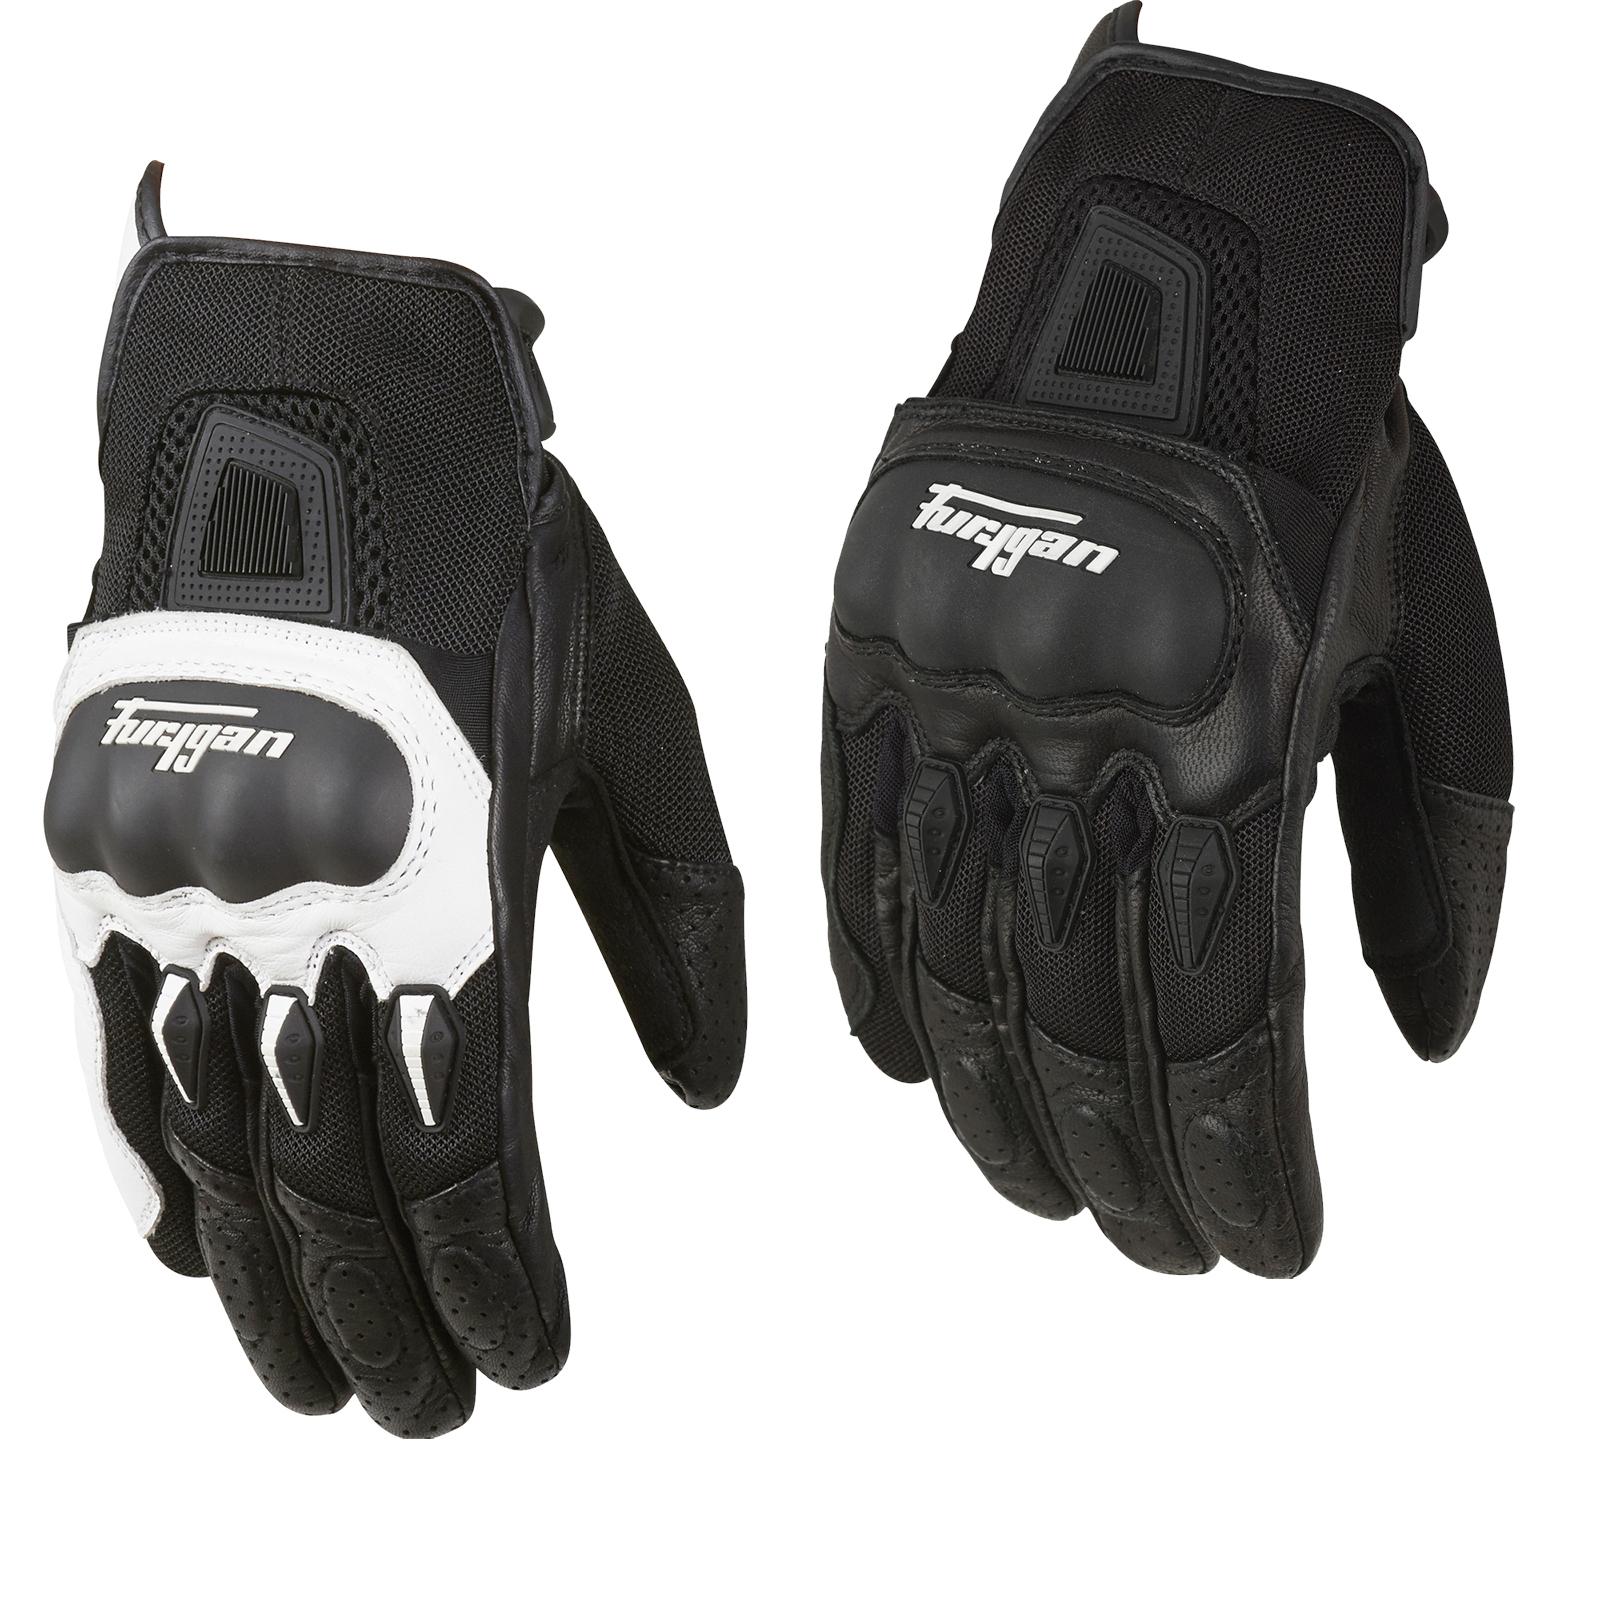 Sport Motorcycle Gloves: Furygan Laguna Sport Motorcycle Gloves